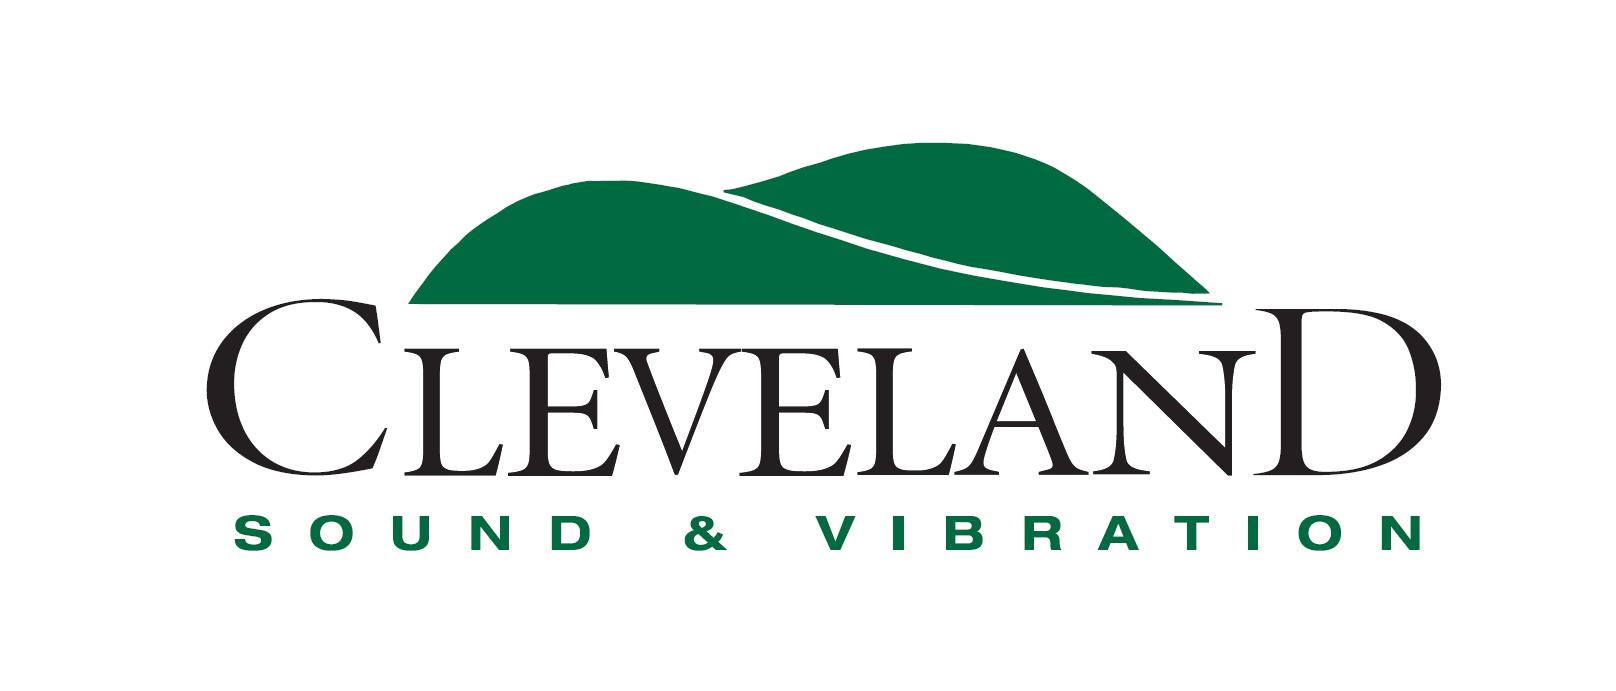 Cleveland